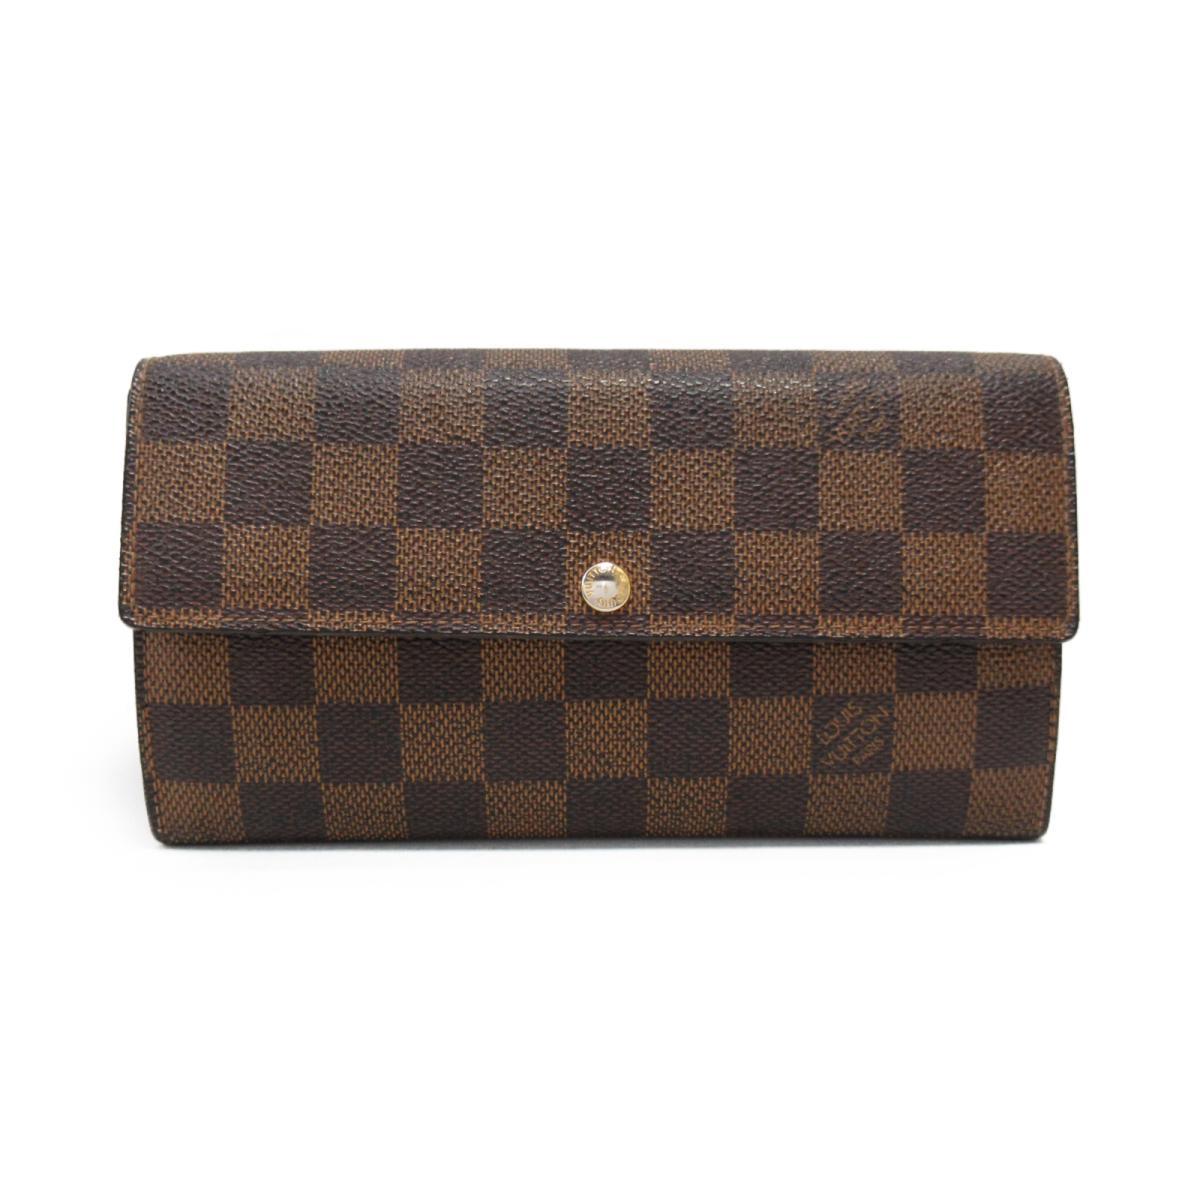 b5d44015c3ed ... 二つ折り長財布 メンズ レディース ダミエ (N61734)   LOUIS VUITTON ビトン ヴィトン ルイ·ヴィトン 長財布 財布  ポルトフォイユ·サラ ブランドオフ BRANDOFF